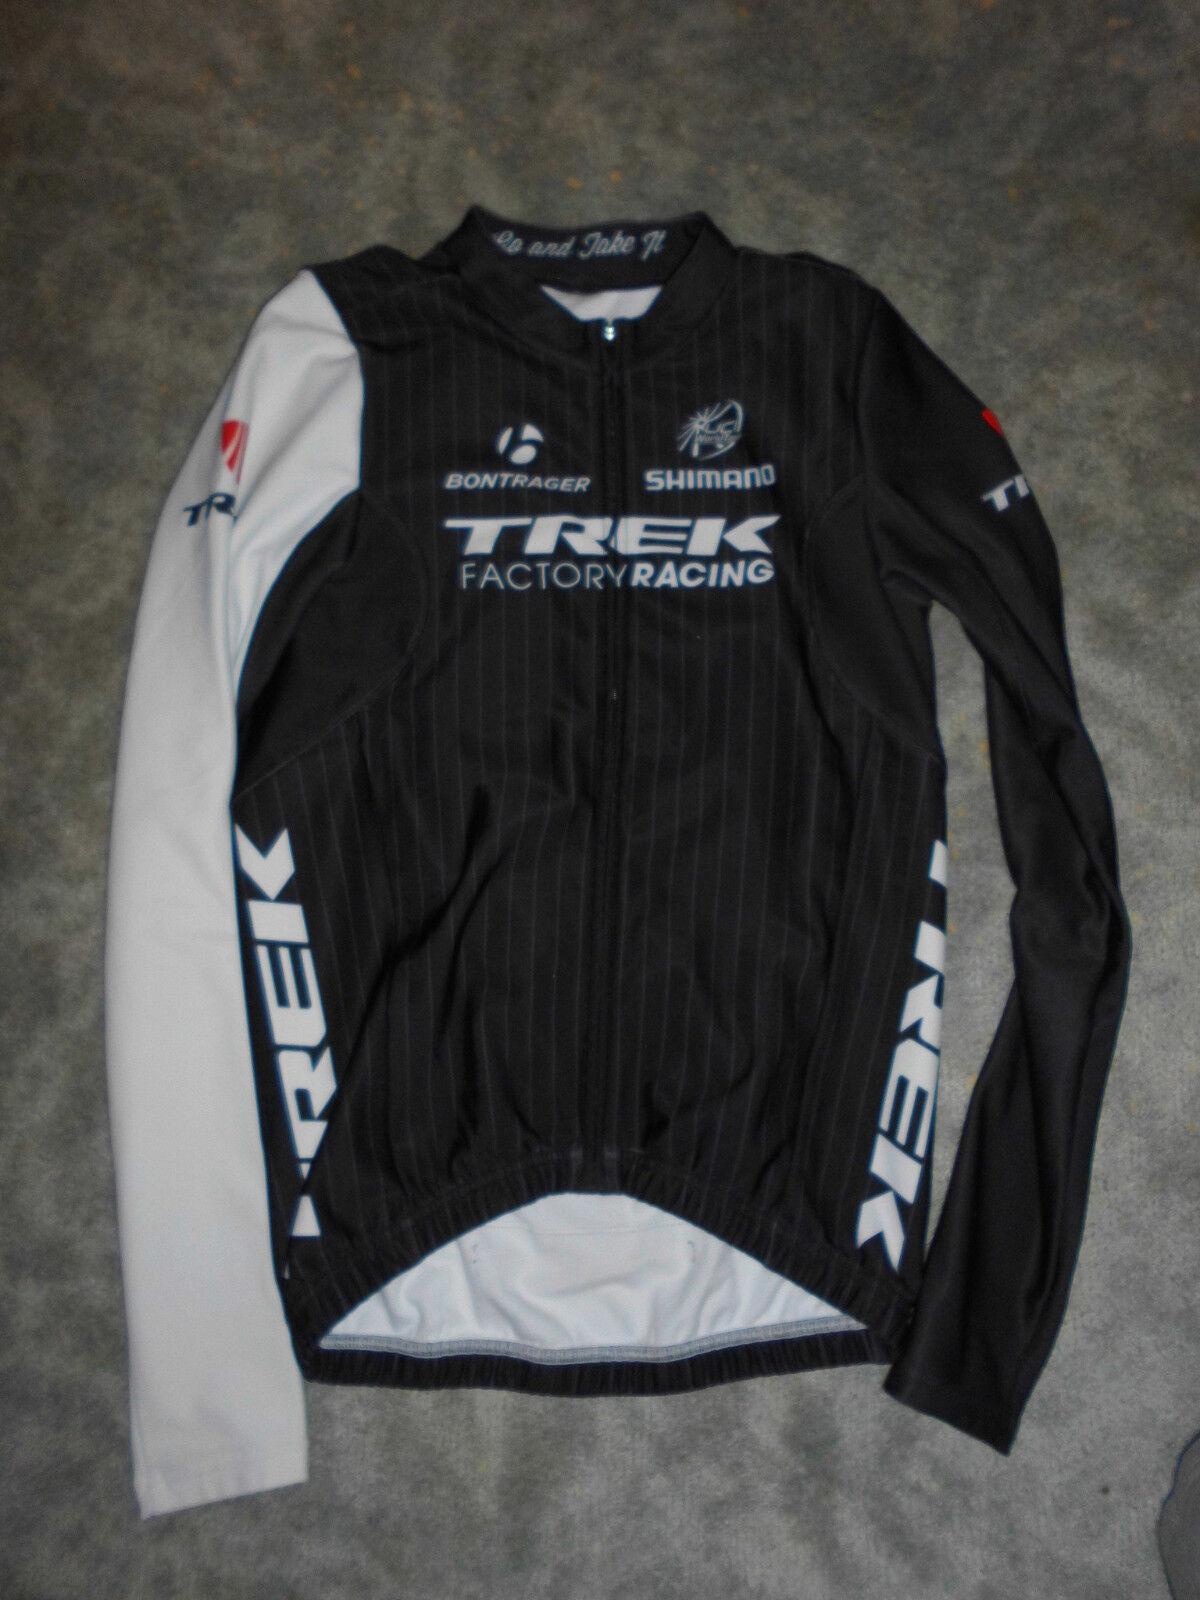 Bontrager equipo Trek Factory Racing thermal invierno camuflaje Chaqueta talla M L